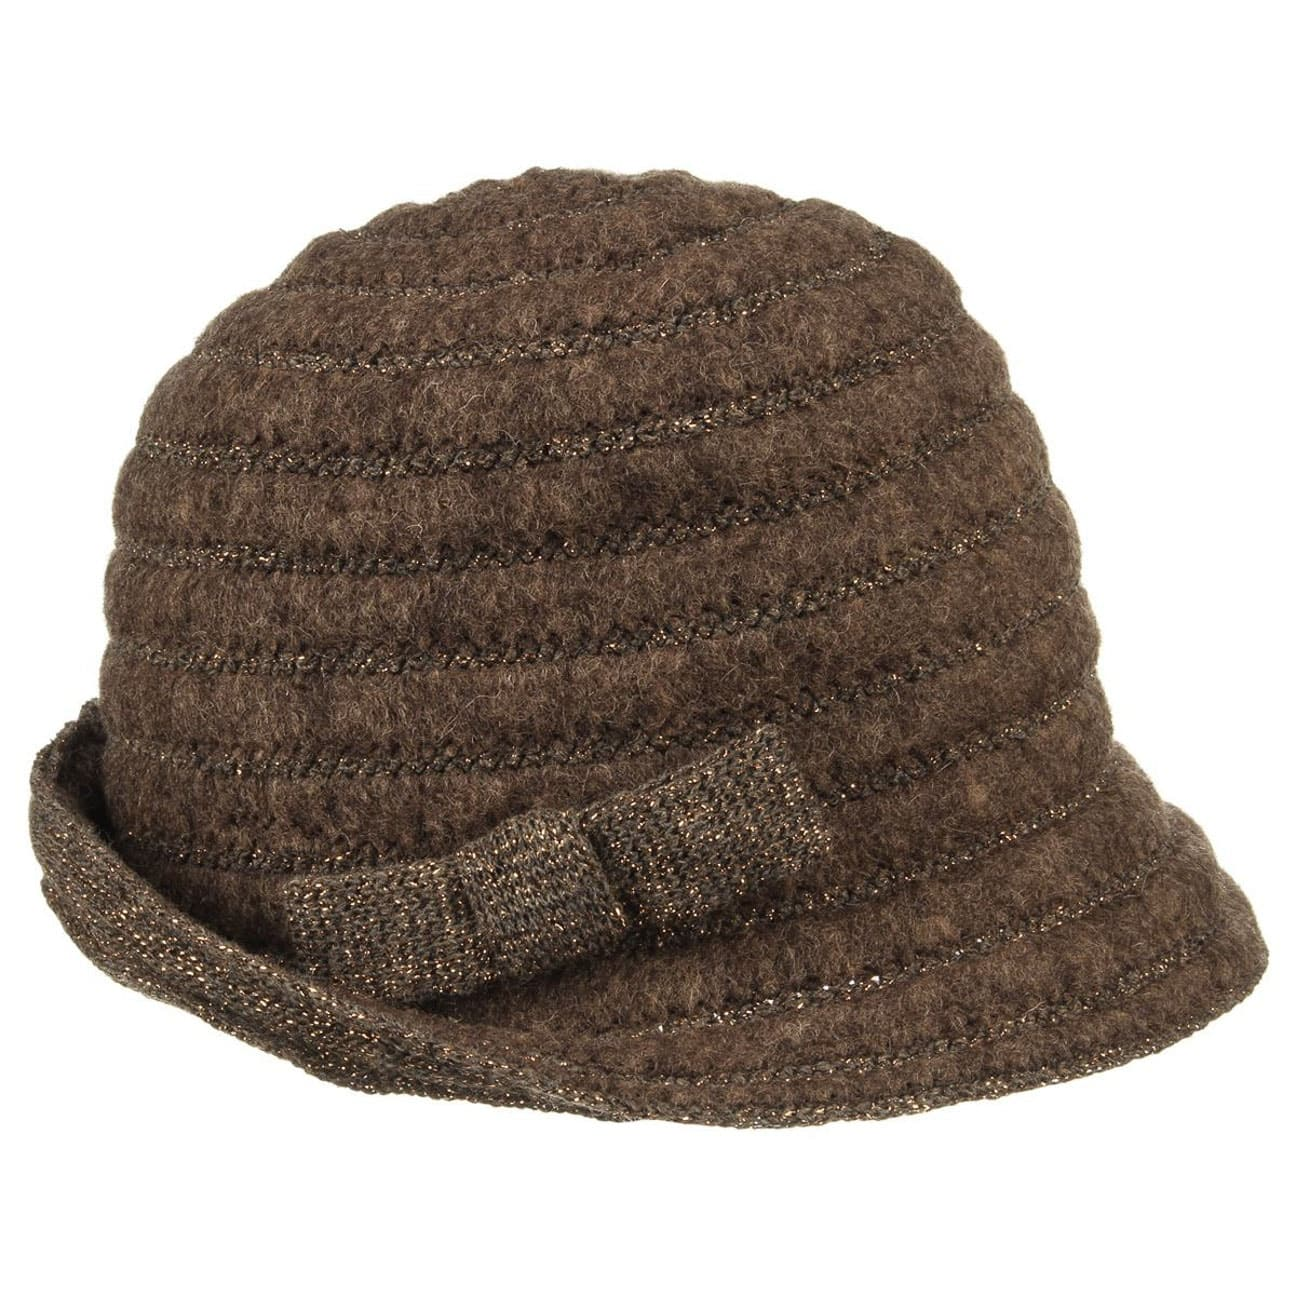 Felt Cloche Hat with Knit Brim by Lierys Floppy hats Lierys WBQ8LY